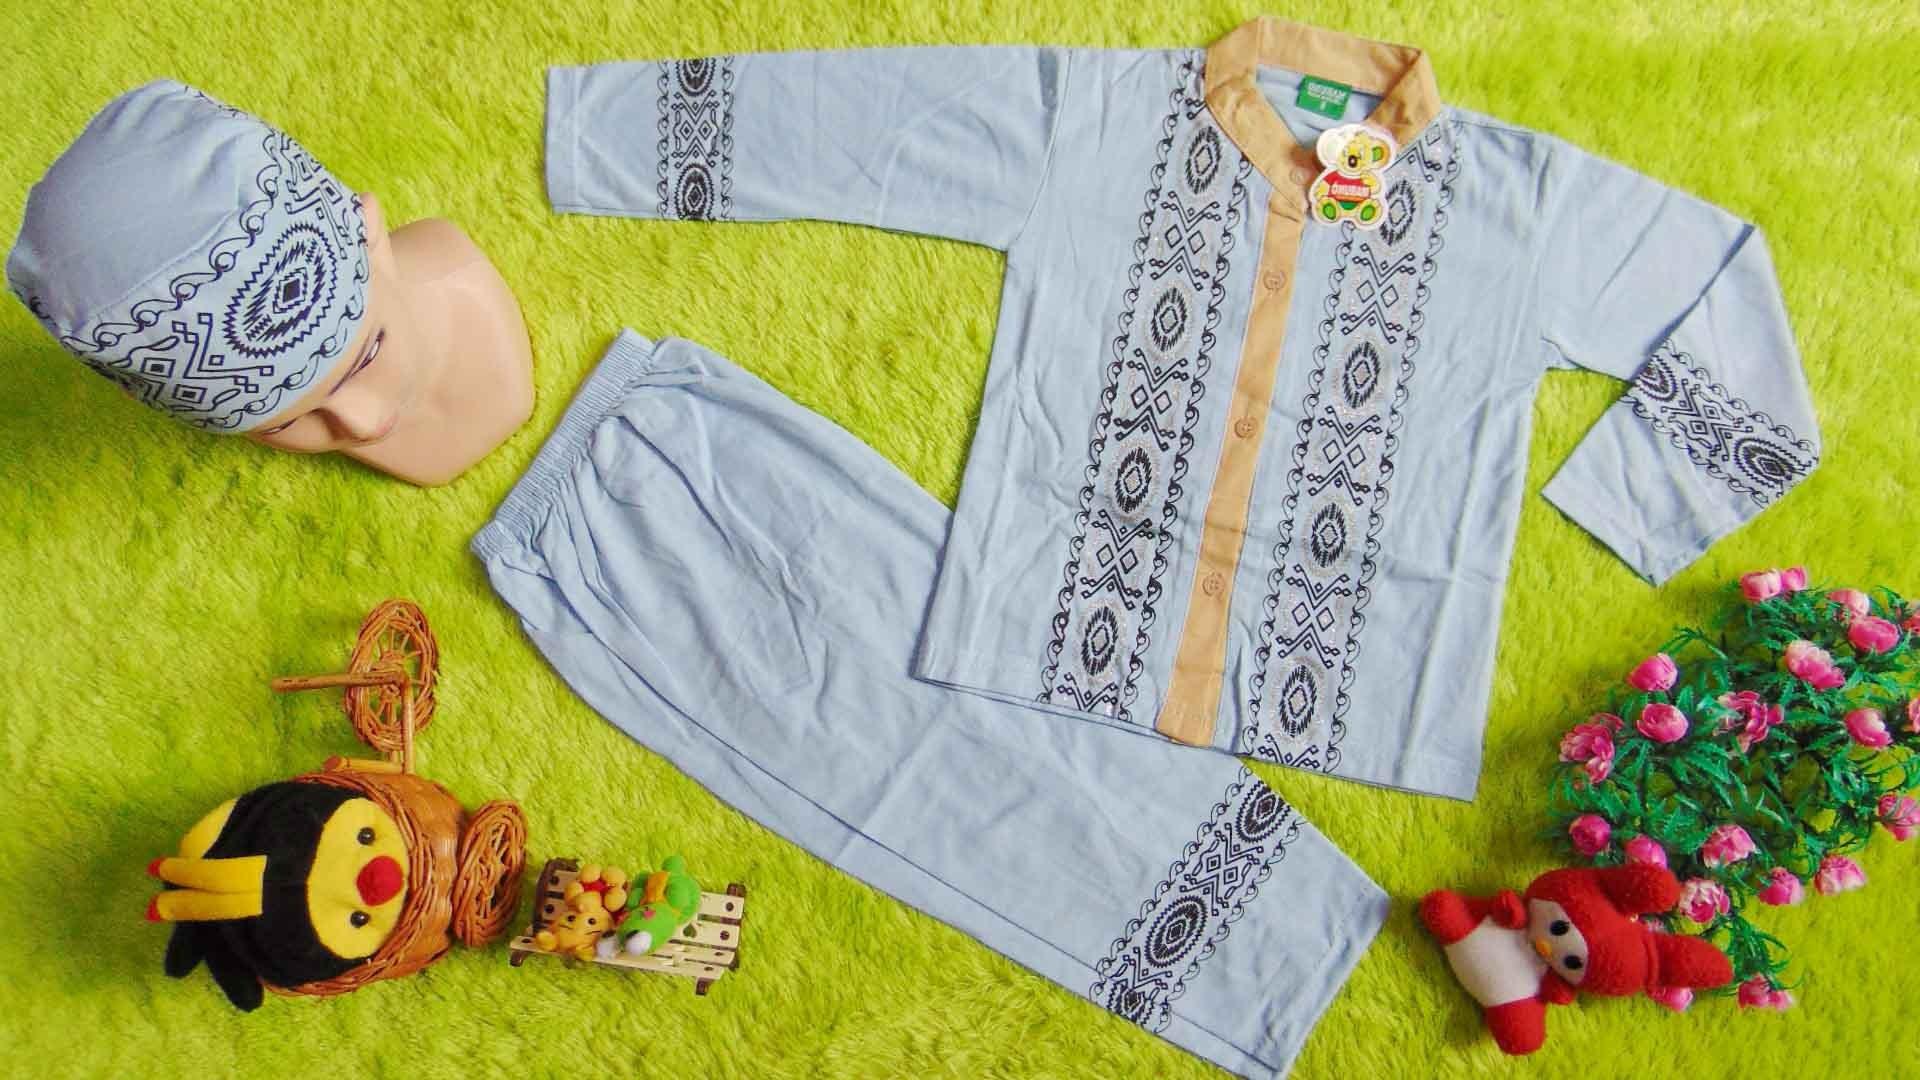 Ide Baju Lebaran Anak 2 Tahun Gdd0 Paling Laris Setelan Baju Koko Muslim Lebaran Ramadhan